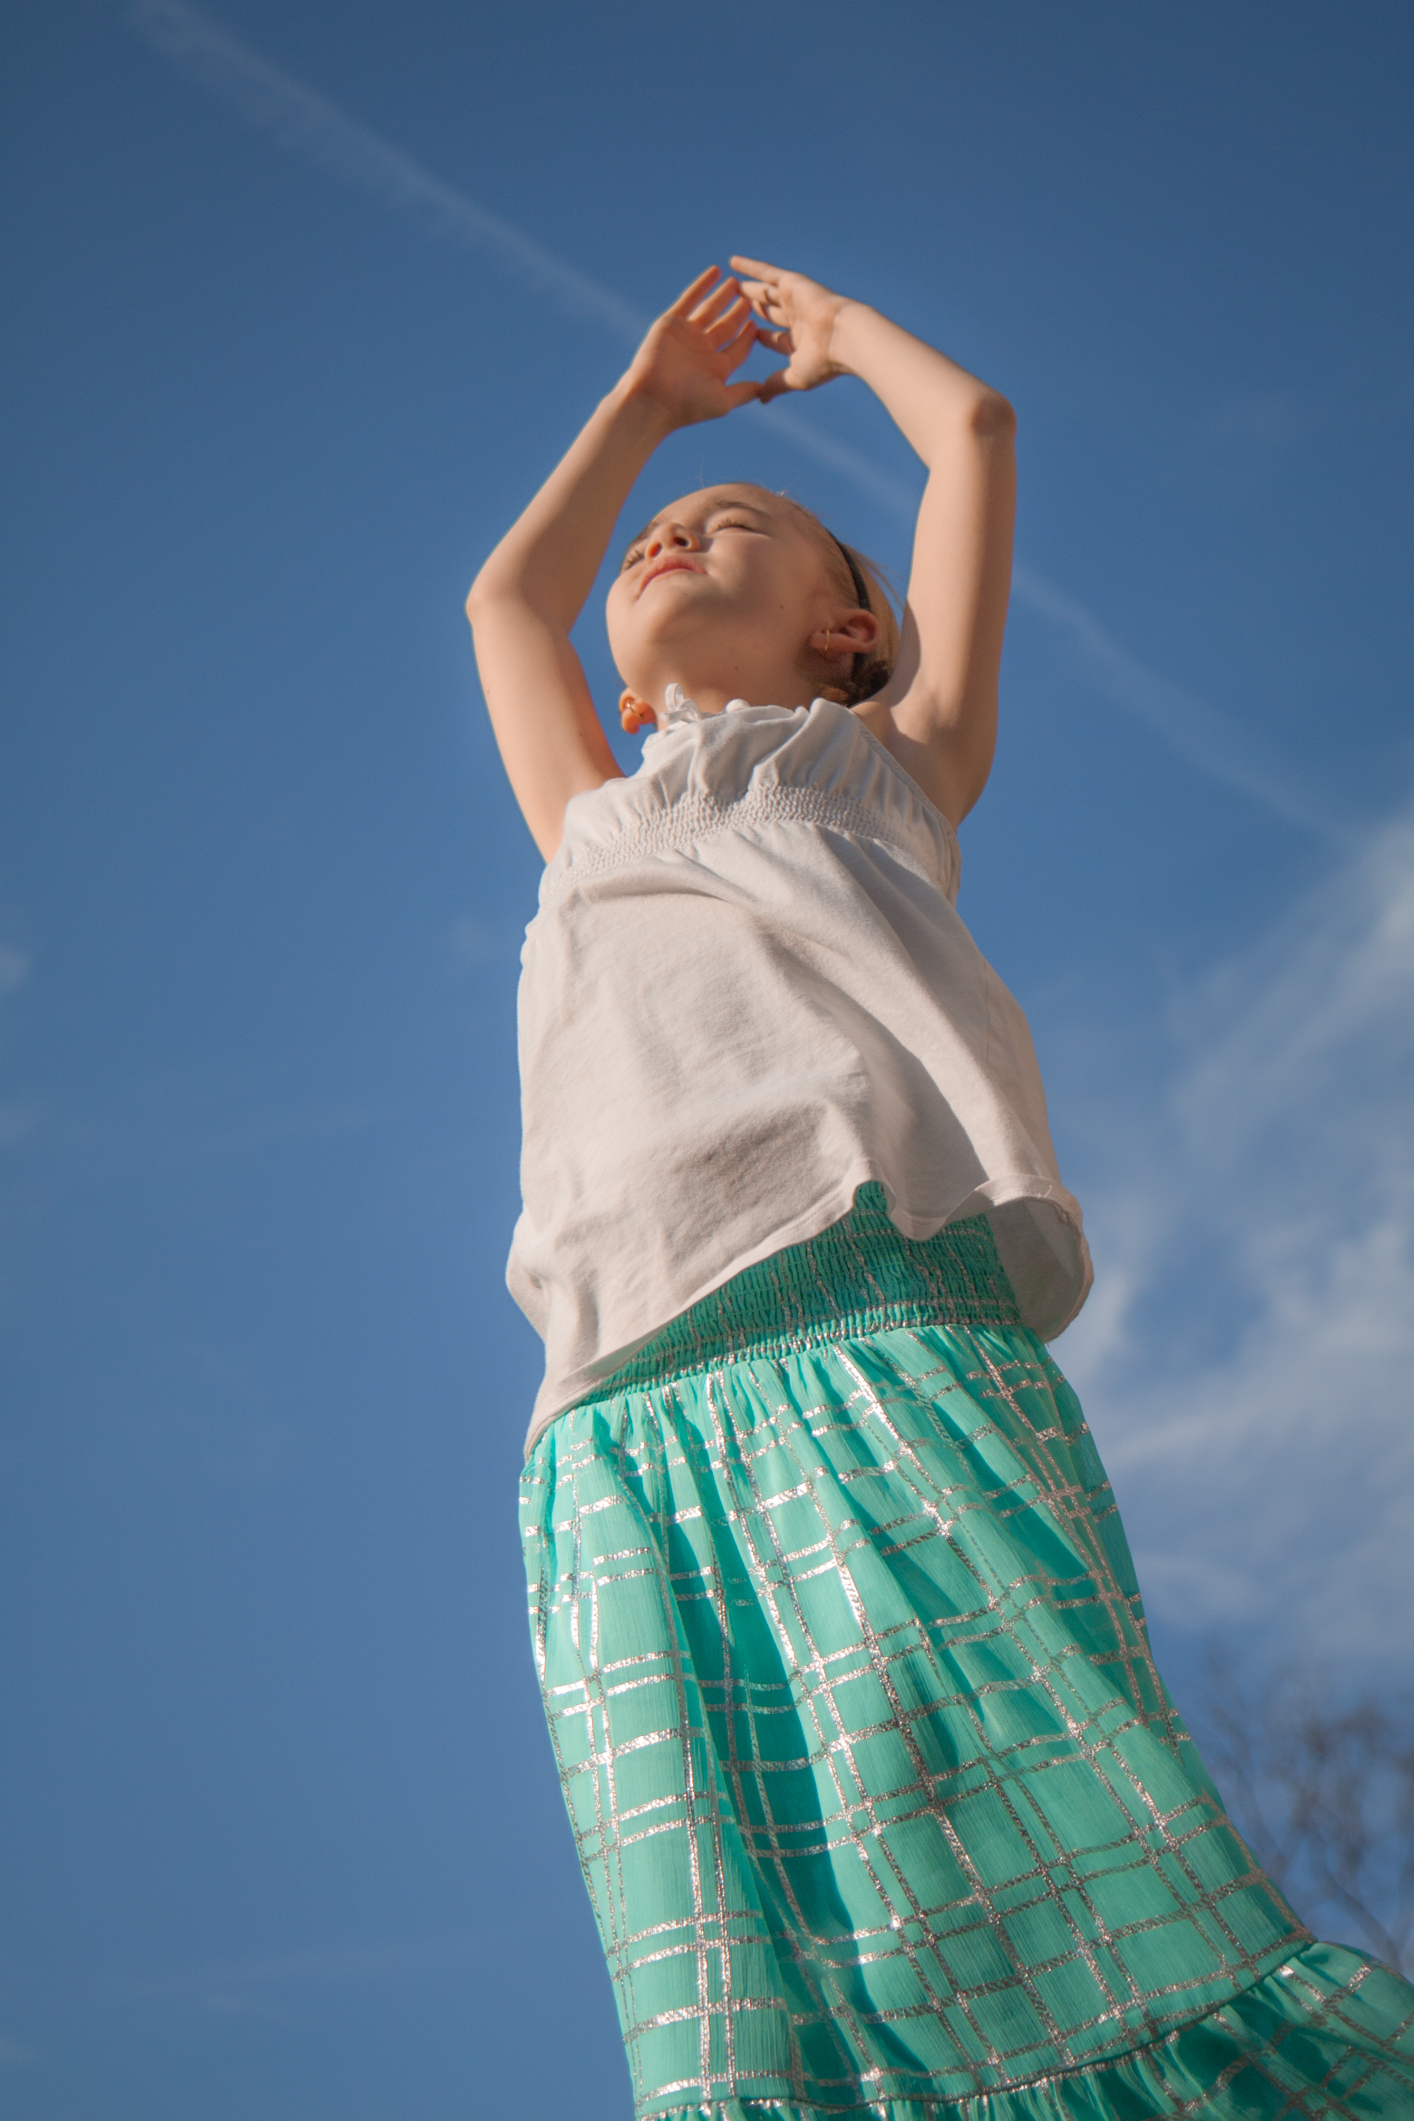 Girl soaks in the sun with hands raised above head NotSoSAHM